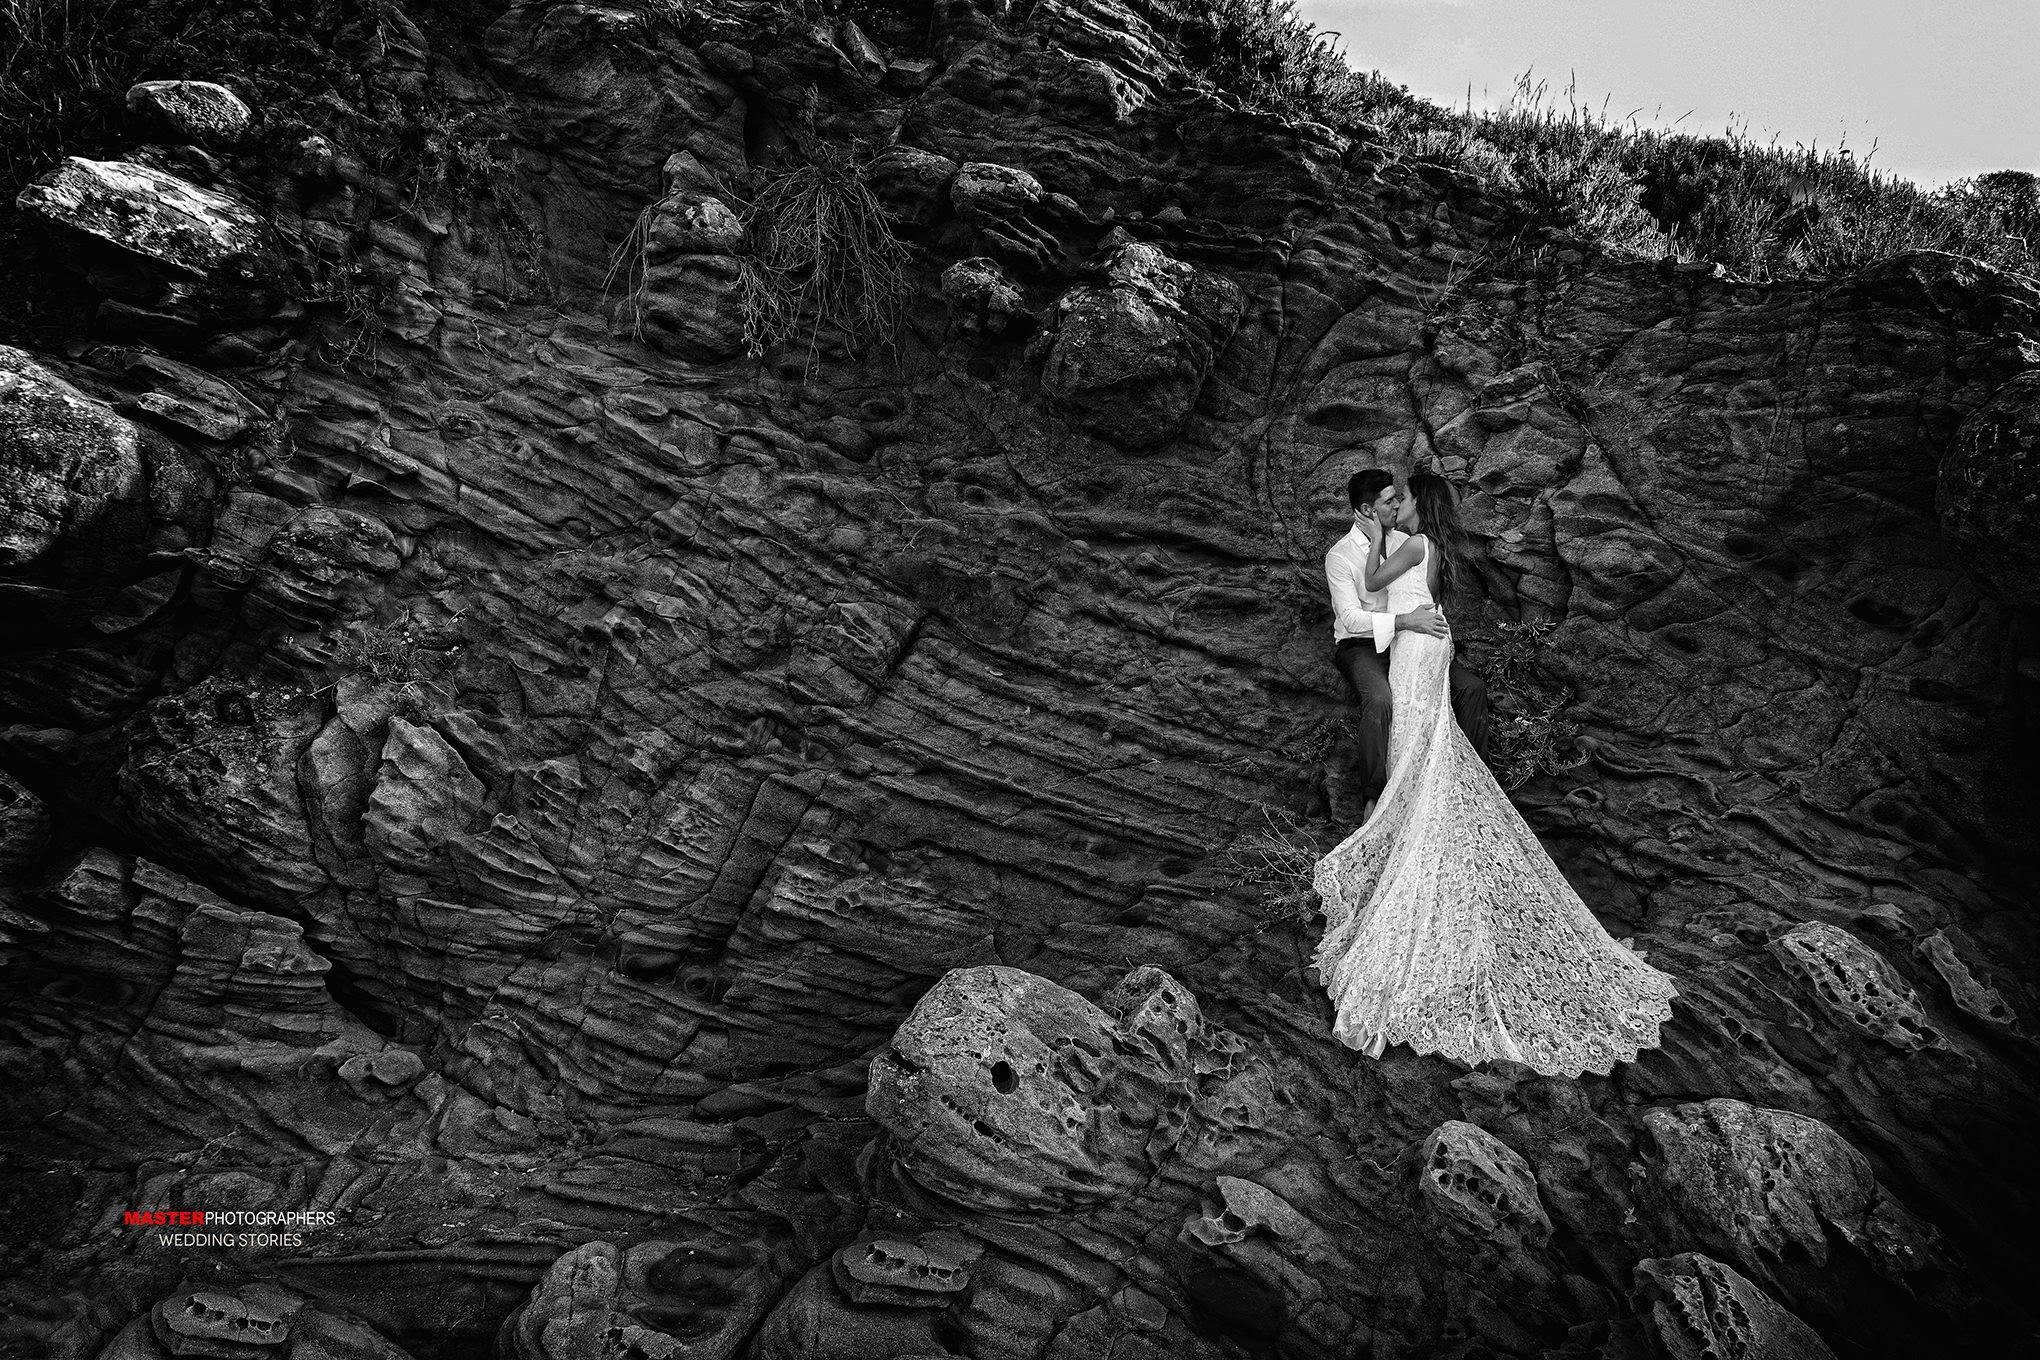 A kiss on the rocks